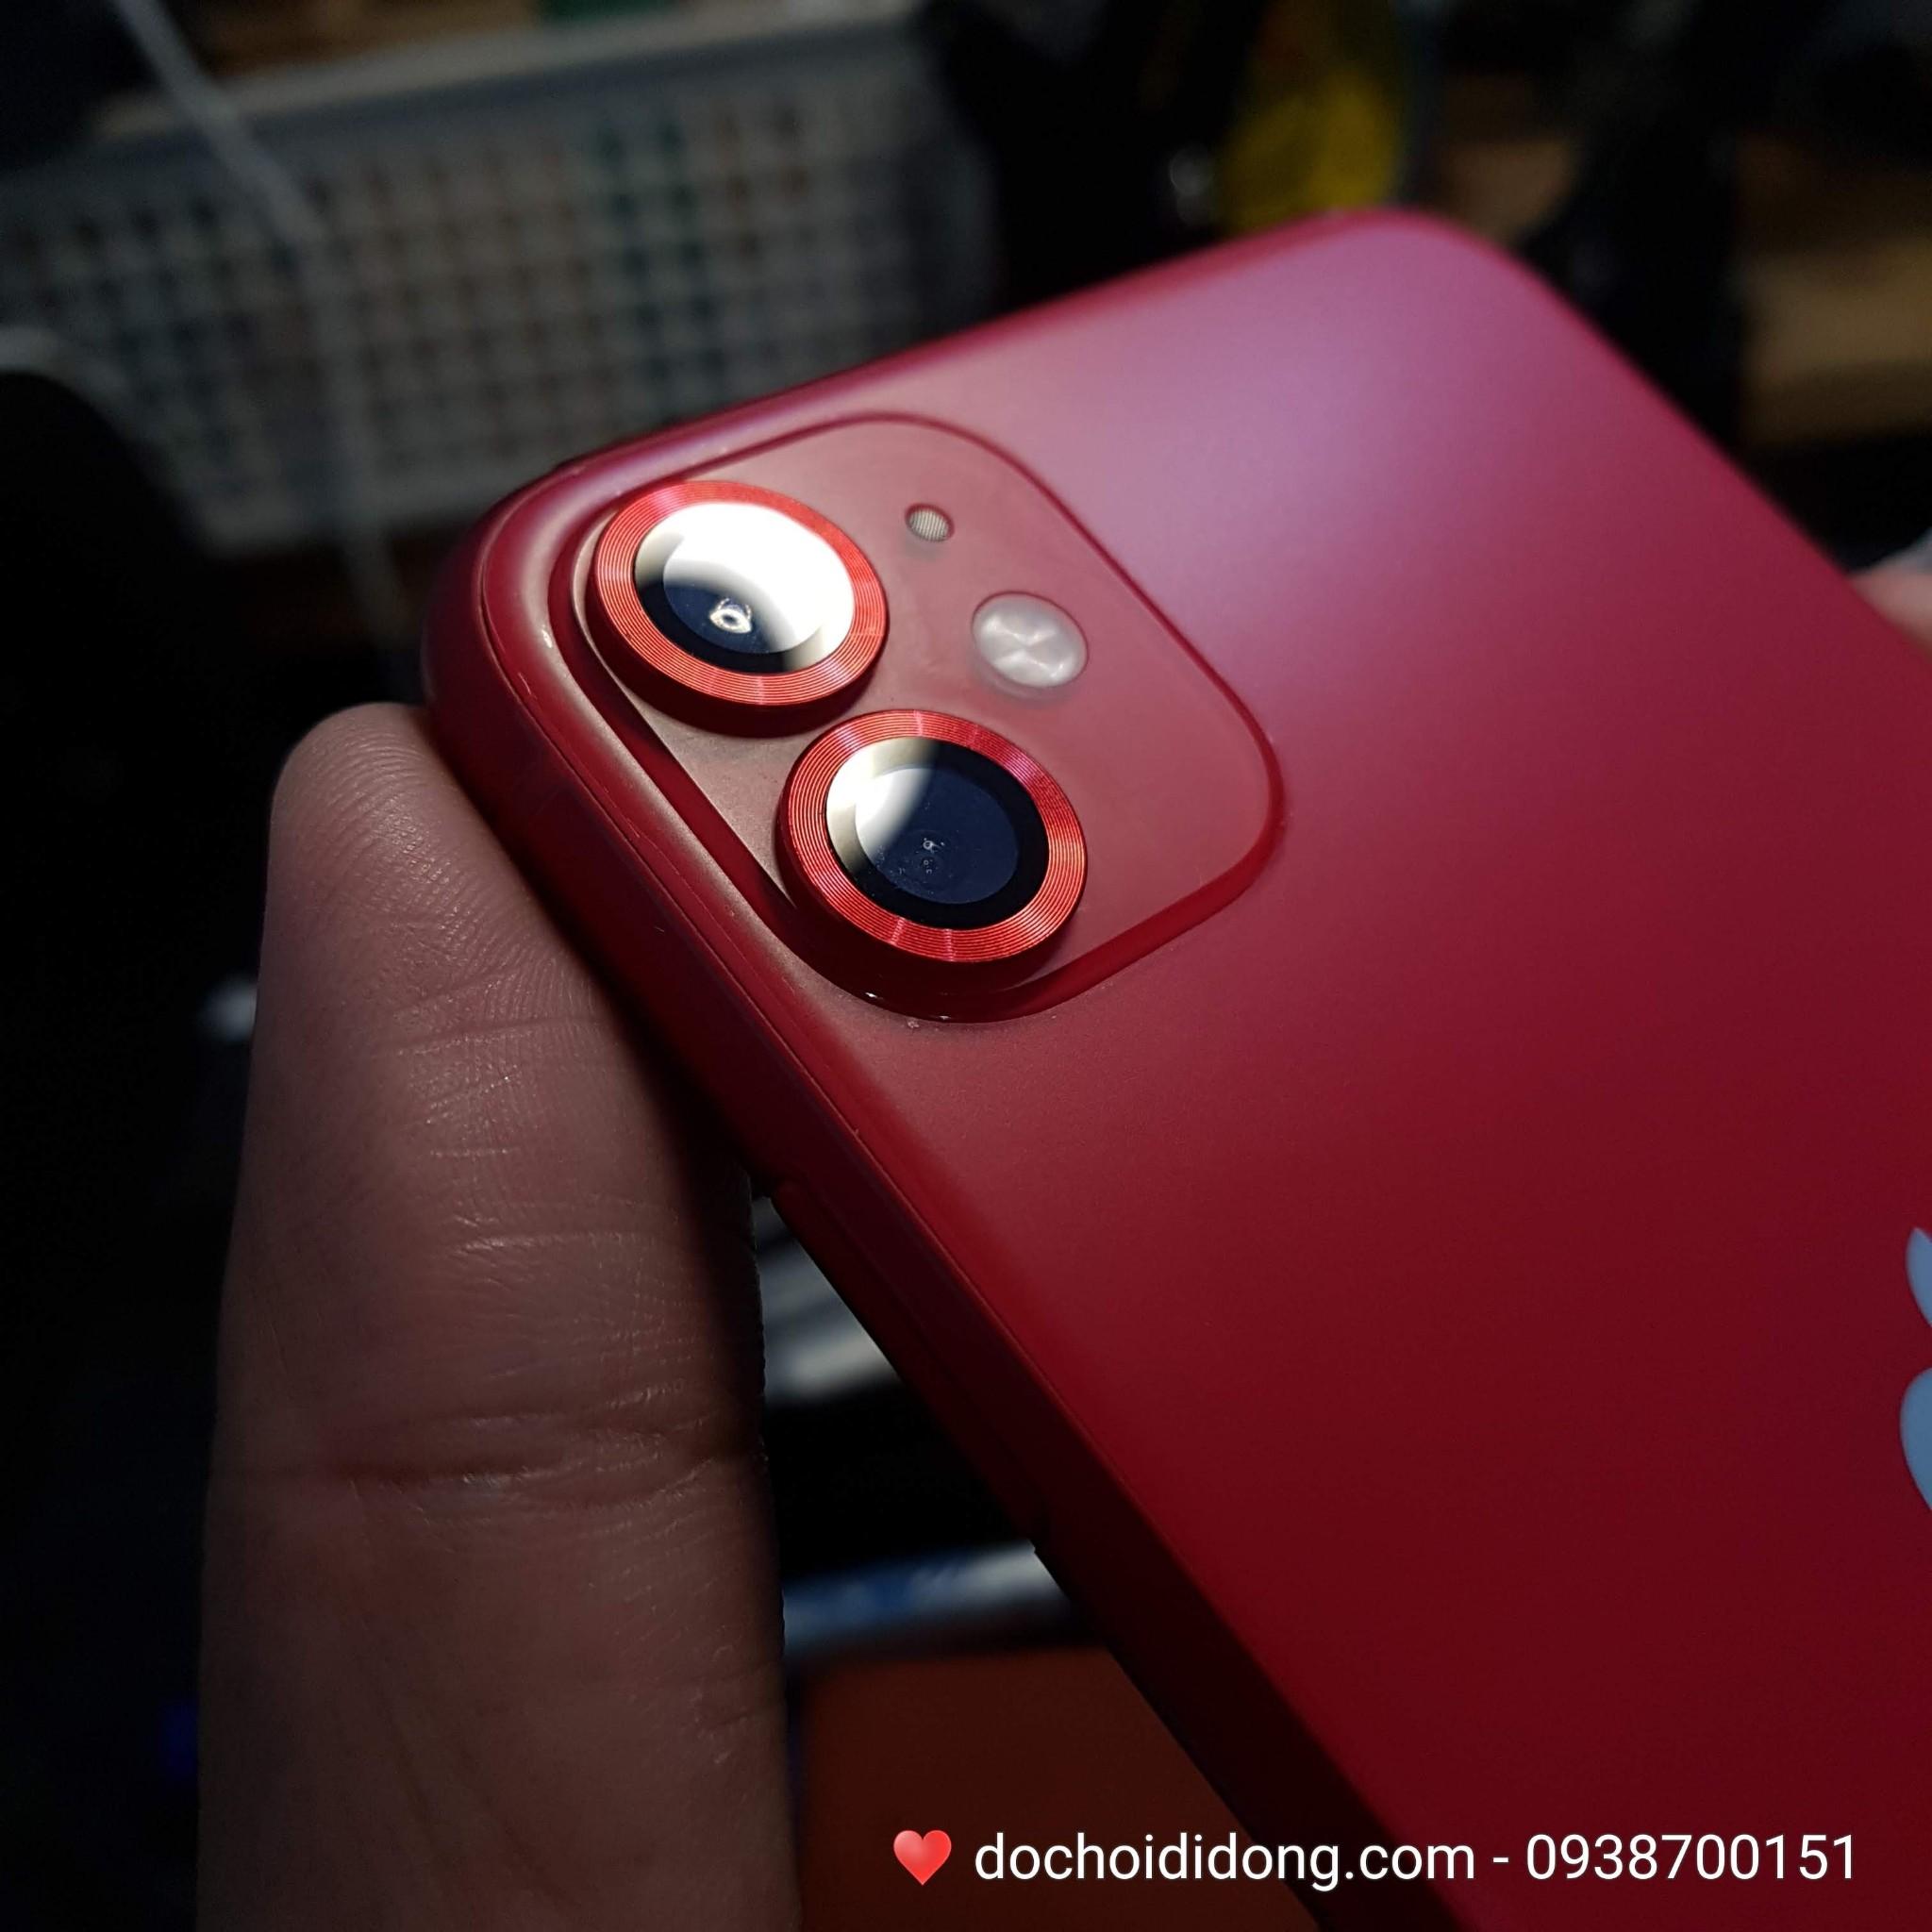 mieng-dan-ppf-rock-iphone-11-trong-nham-doi-mau-cao-cap